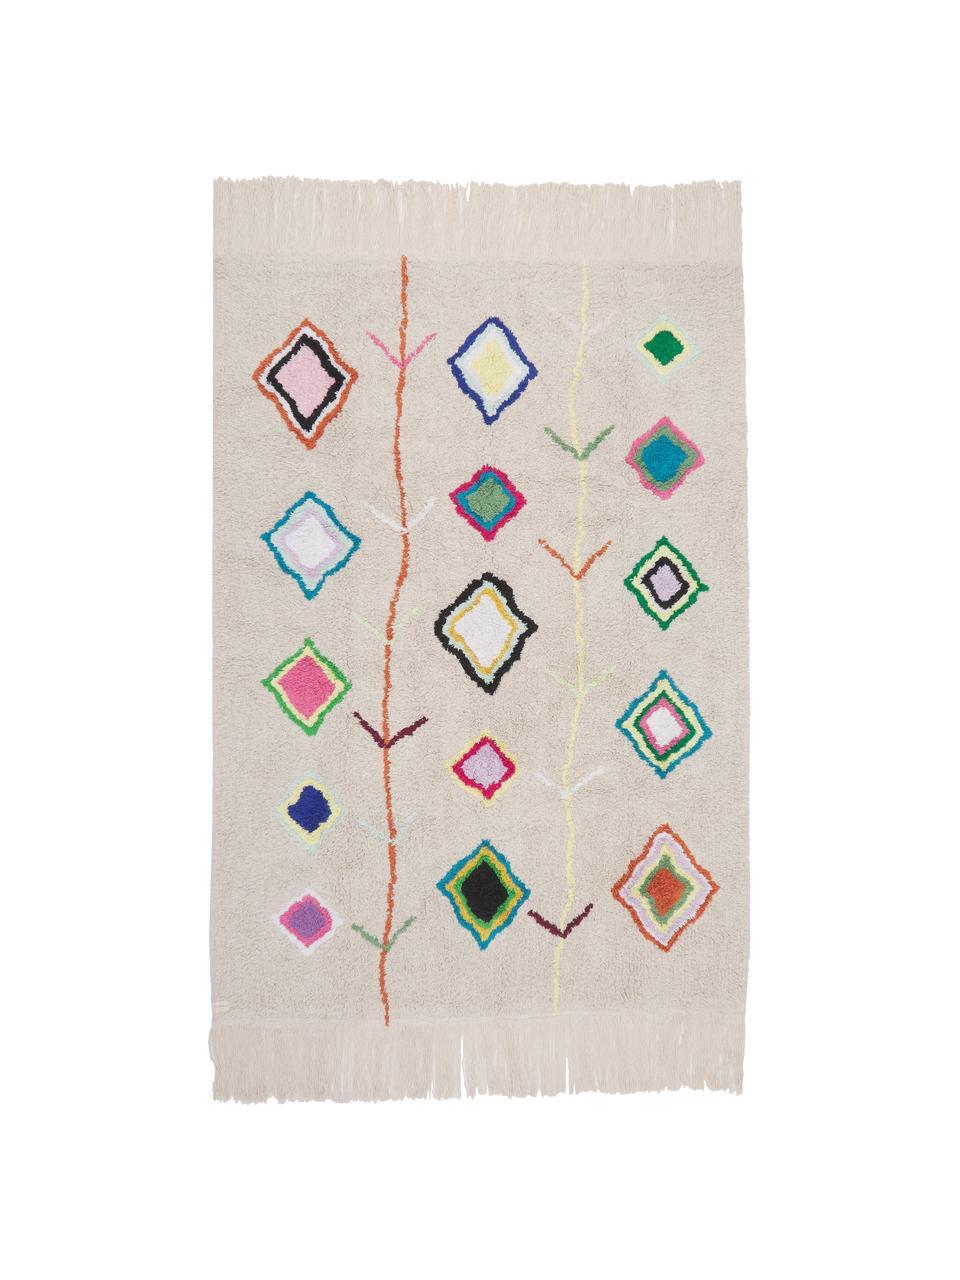 Tapis multicolore fait main Kaarol, Multicolore